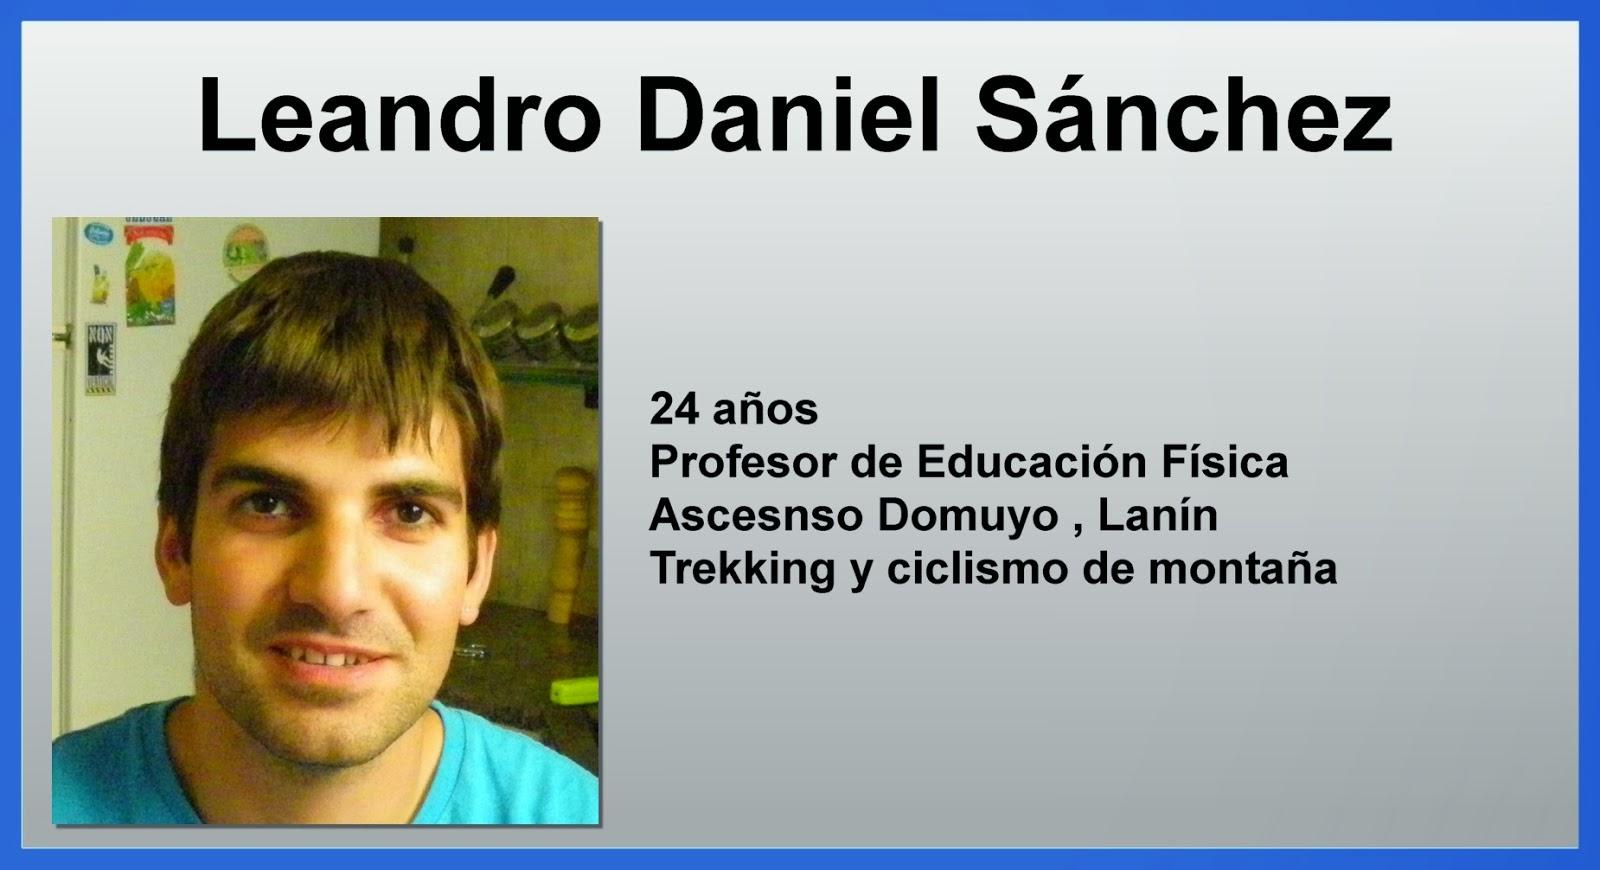 https://www.facebook.com/leo.sanchez.9809?fref=ts